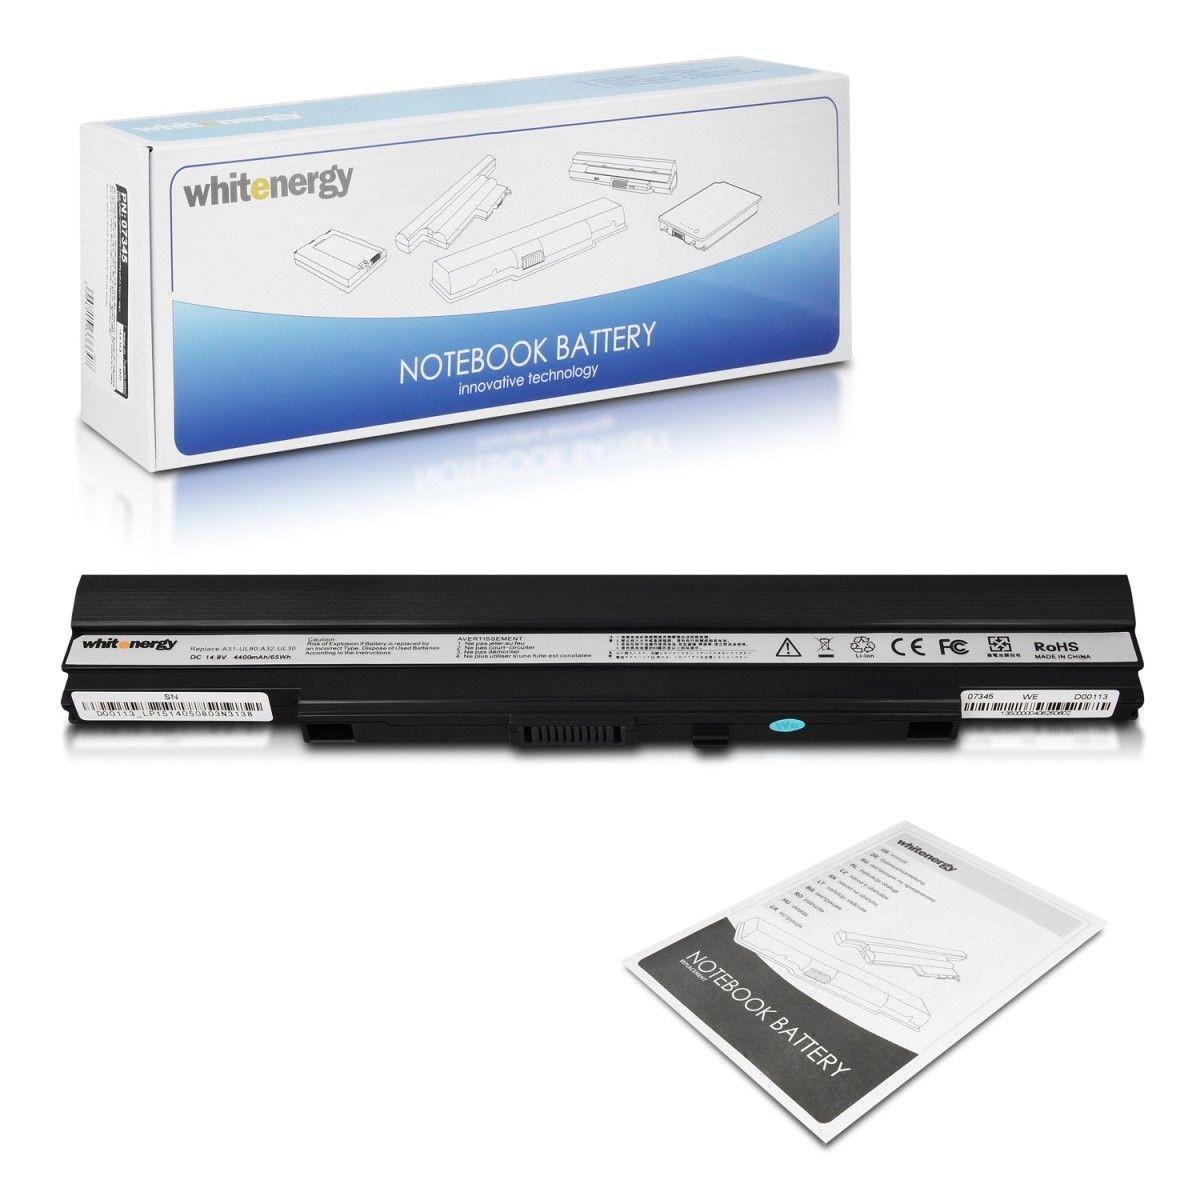 Whitenergy bateria do laptopa Asus A42-UL30/UL50/UL80 14.8V Li-Ion 4400mAh